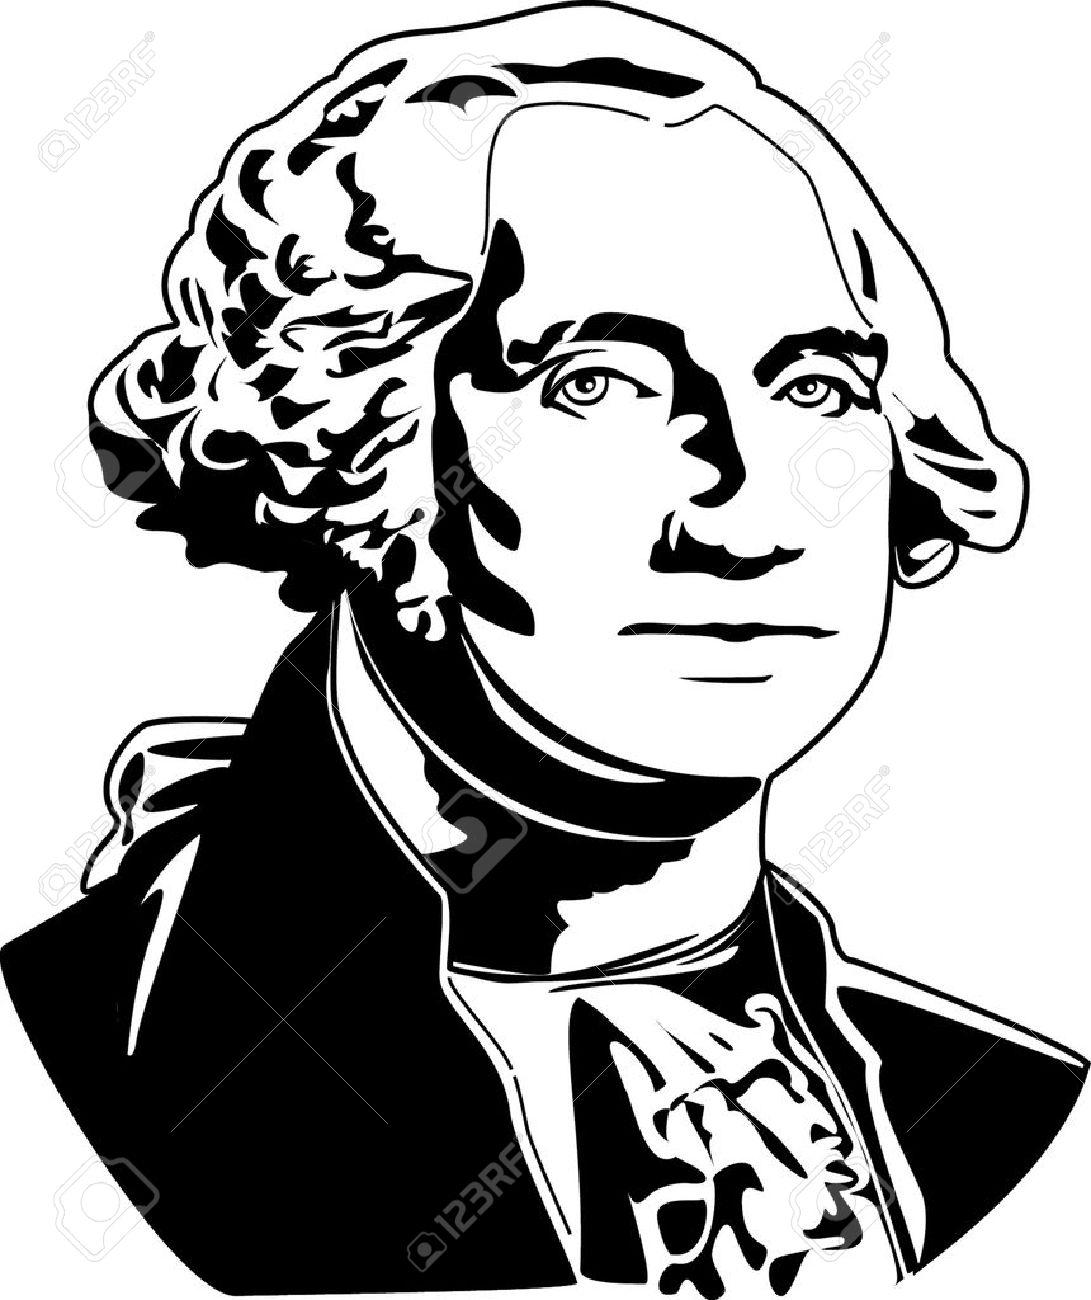 Black and white vector illustration of George Washington.